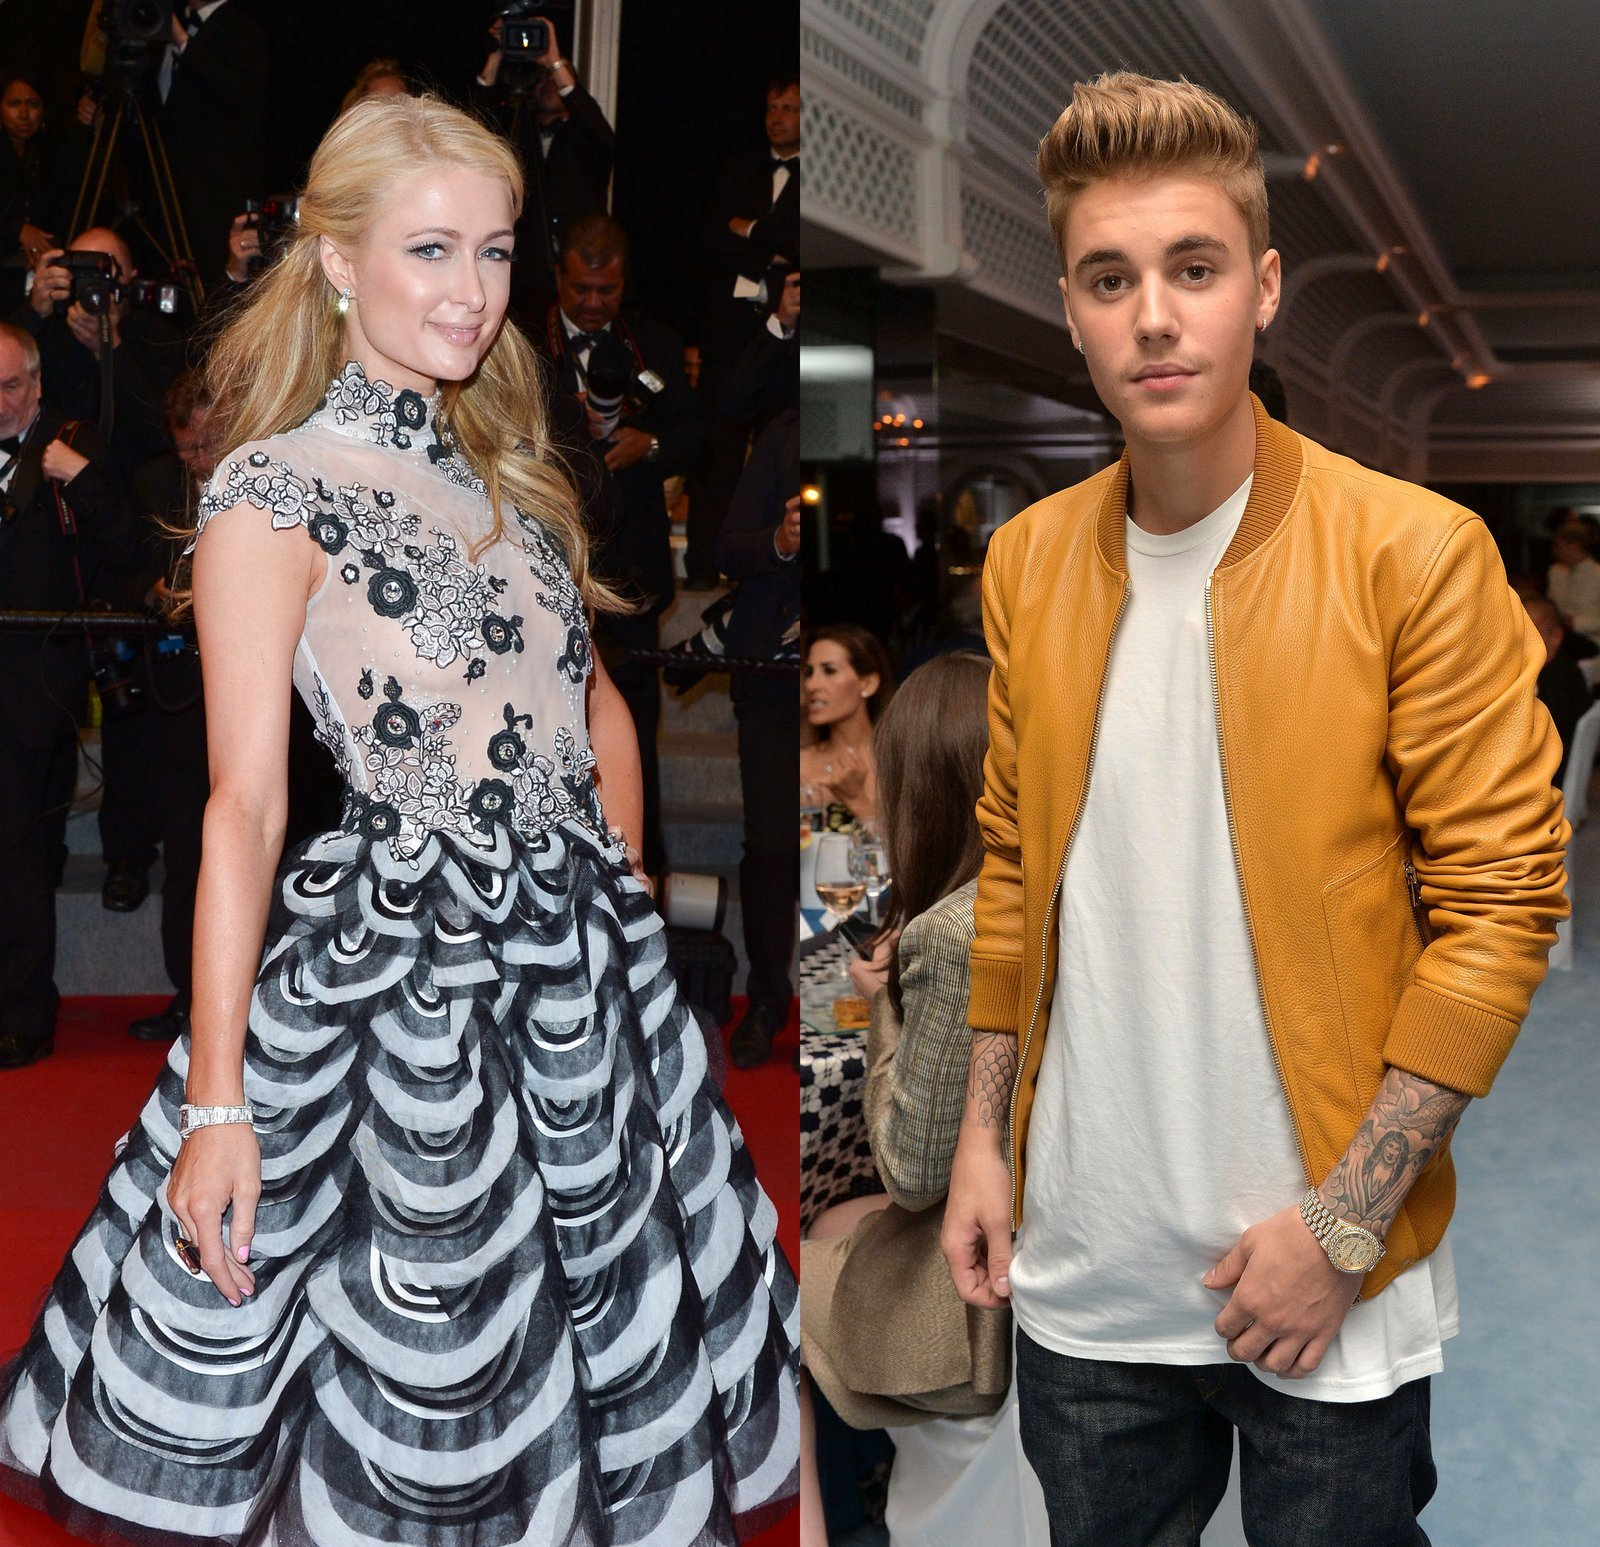 Justin Bieber and Paris Hilton